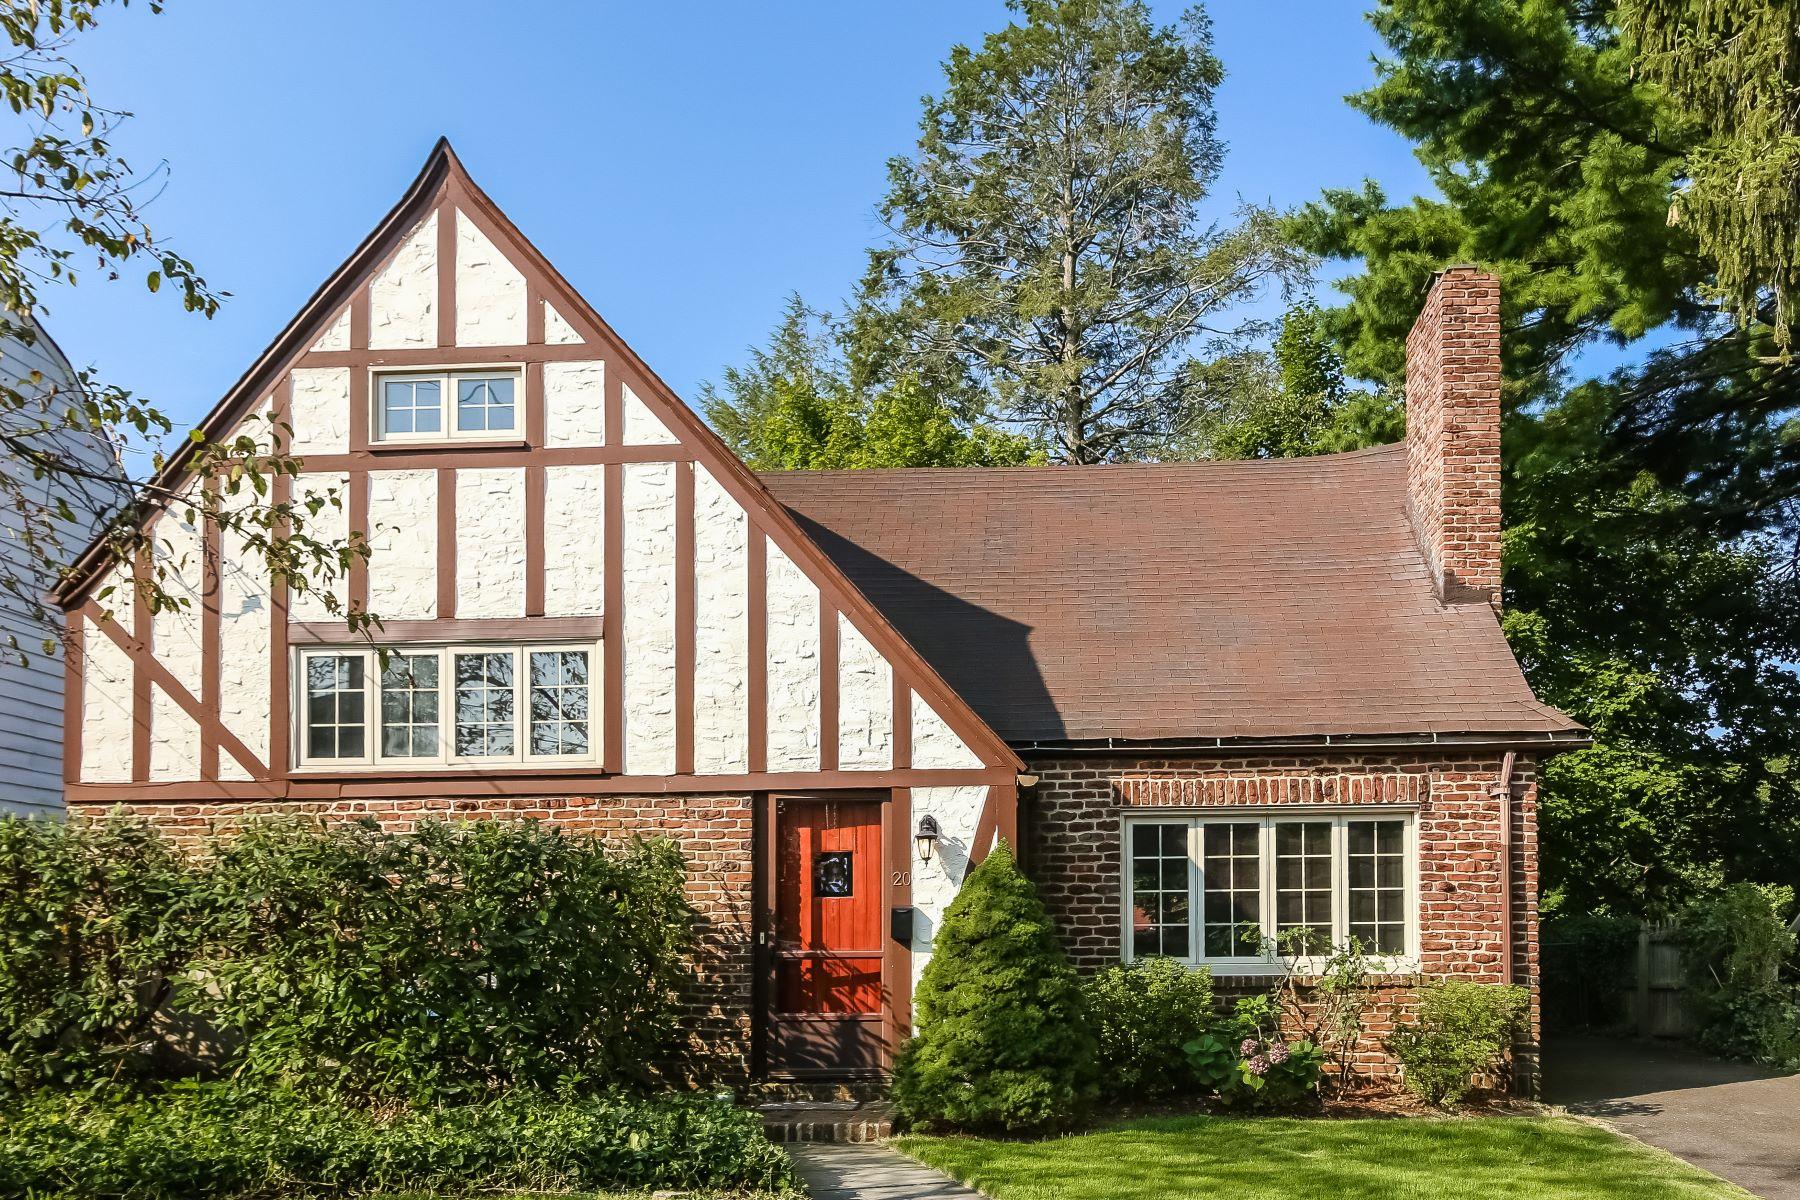 独户住宅 为 销售 在 Charming Larchmont Tudor 20 Alden Road 拉奇芒德镇, 纽约州, 10538 美国